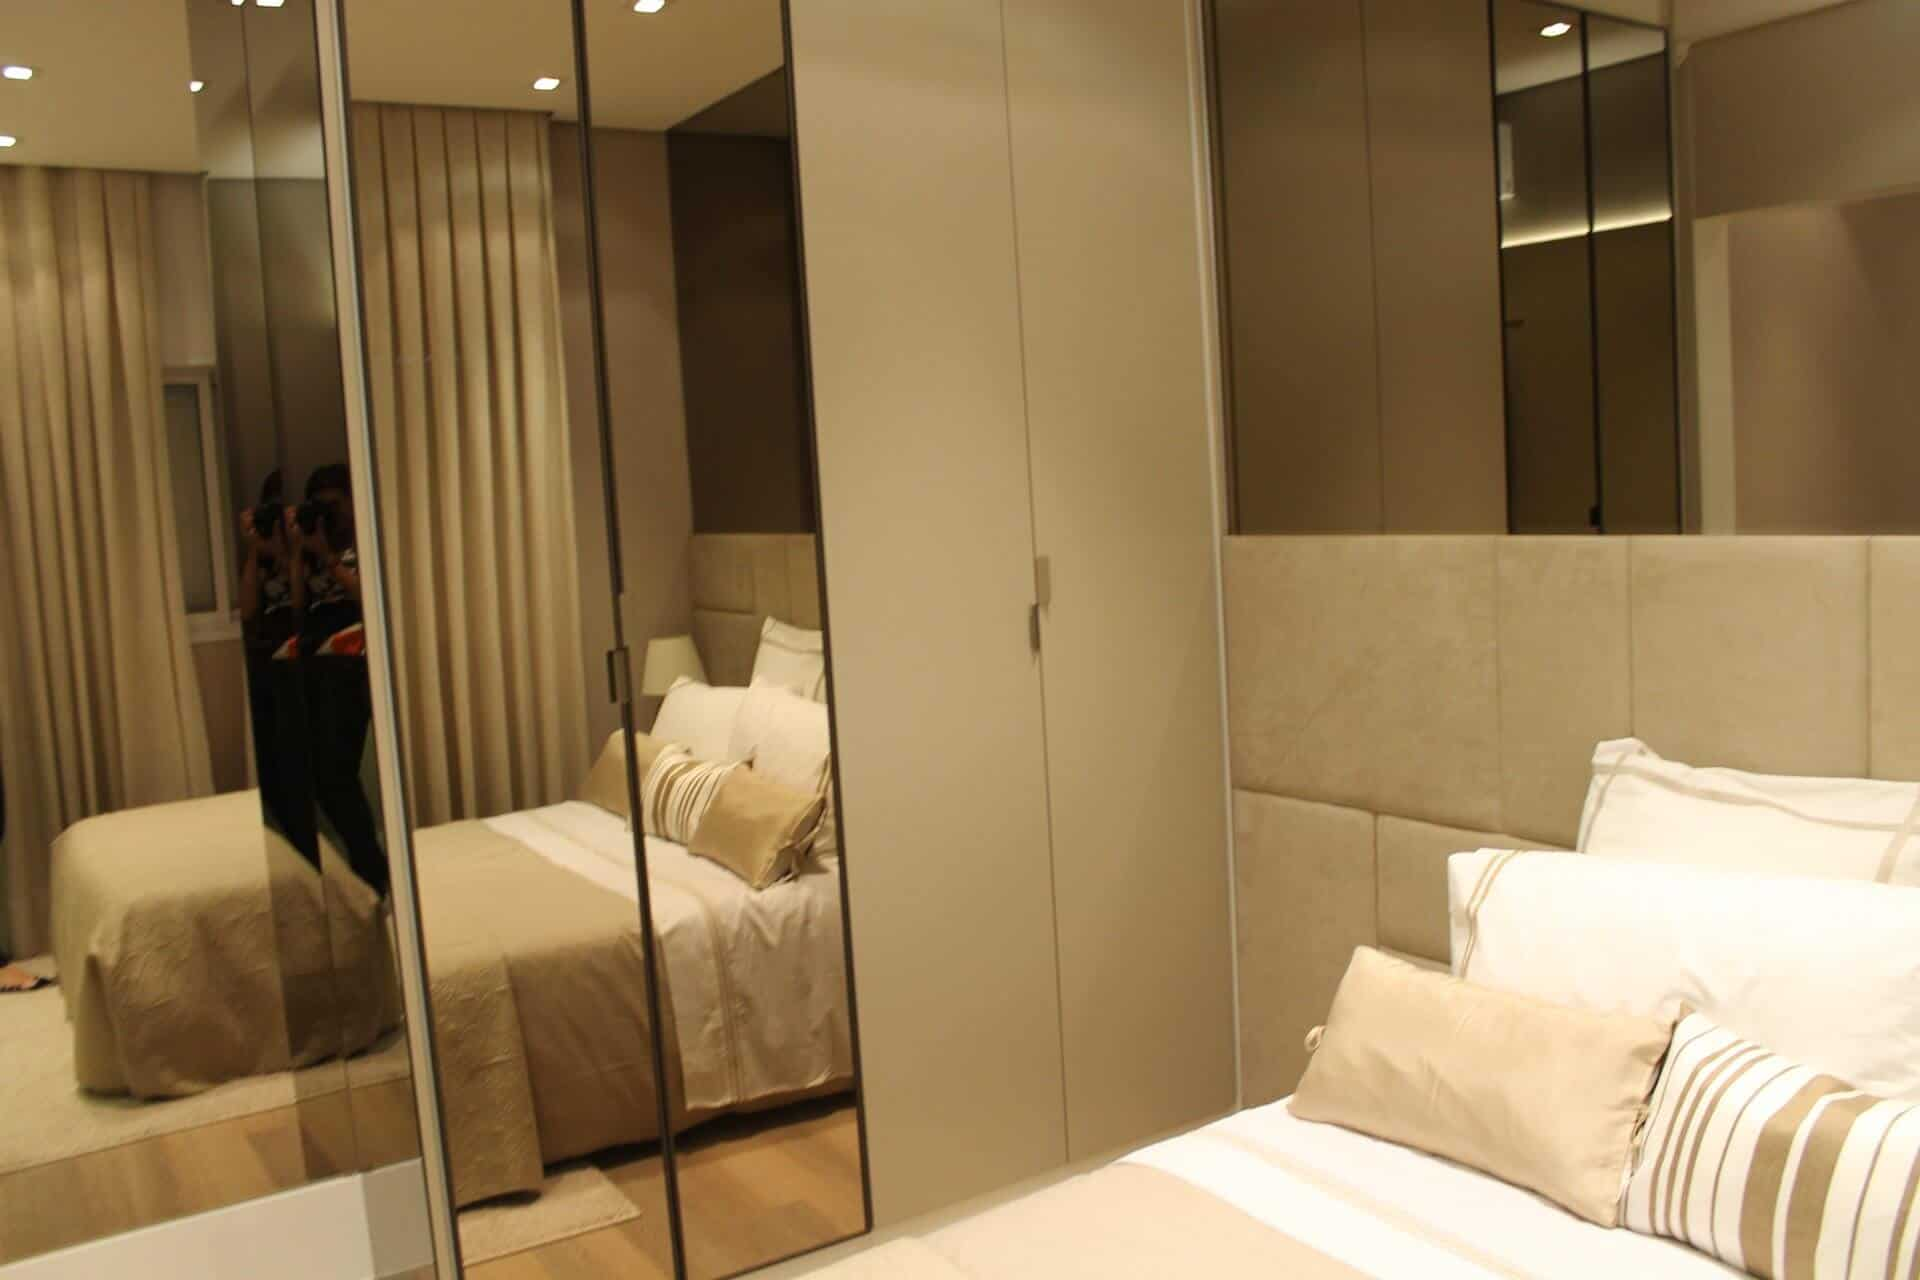 dormitorio-planejado_moveis-sob-medida-galeria-45